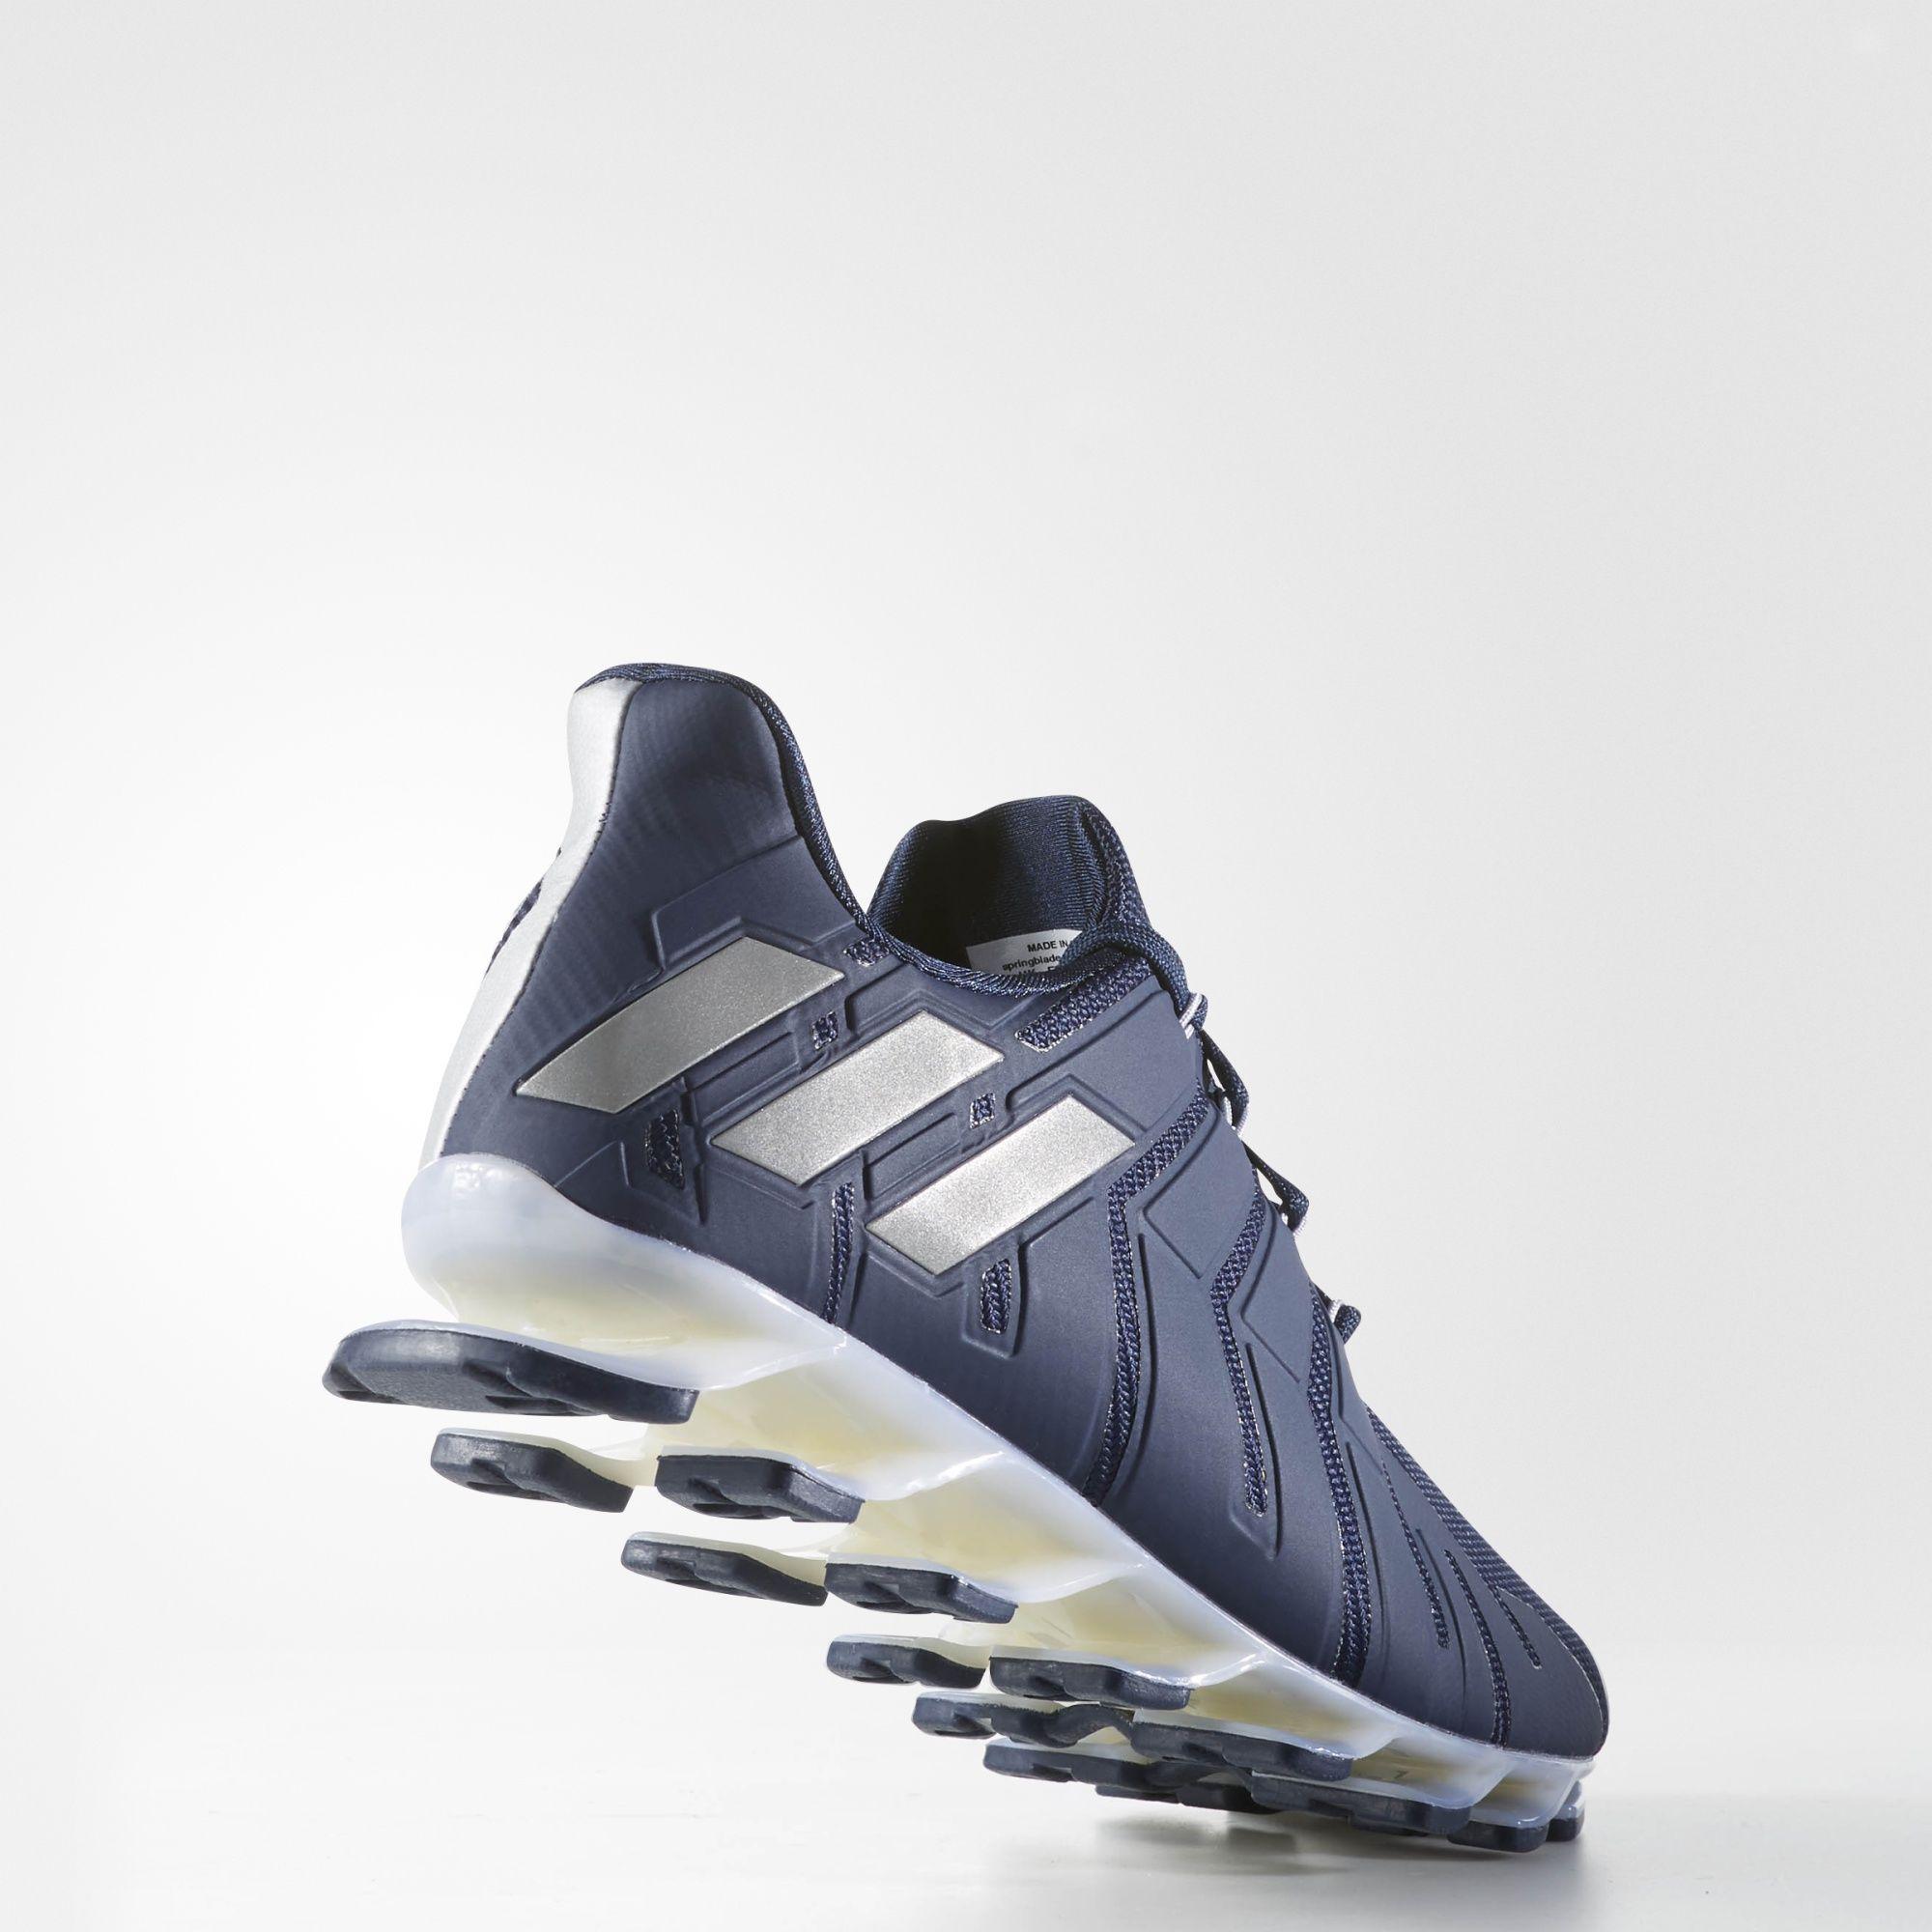 adidas springblade pro m running shoes